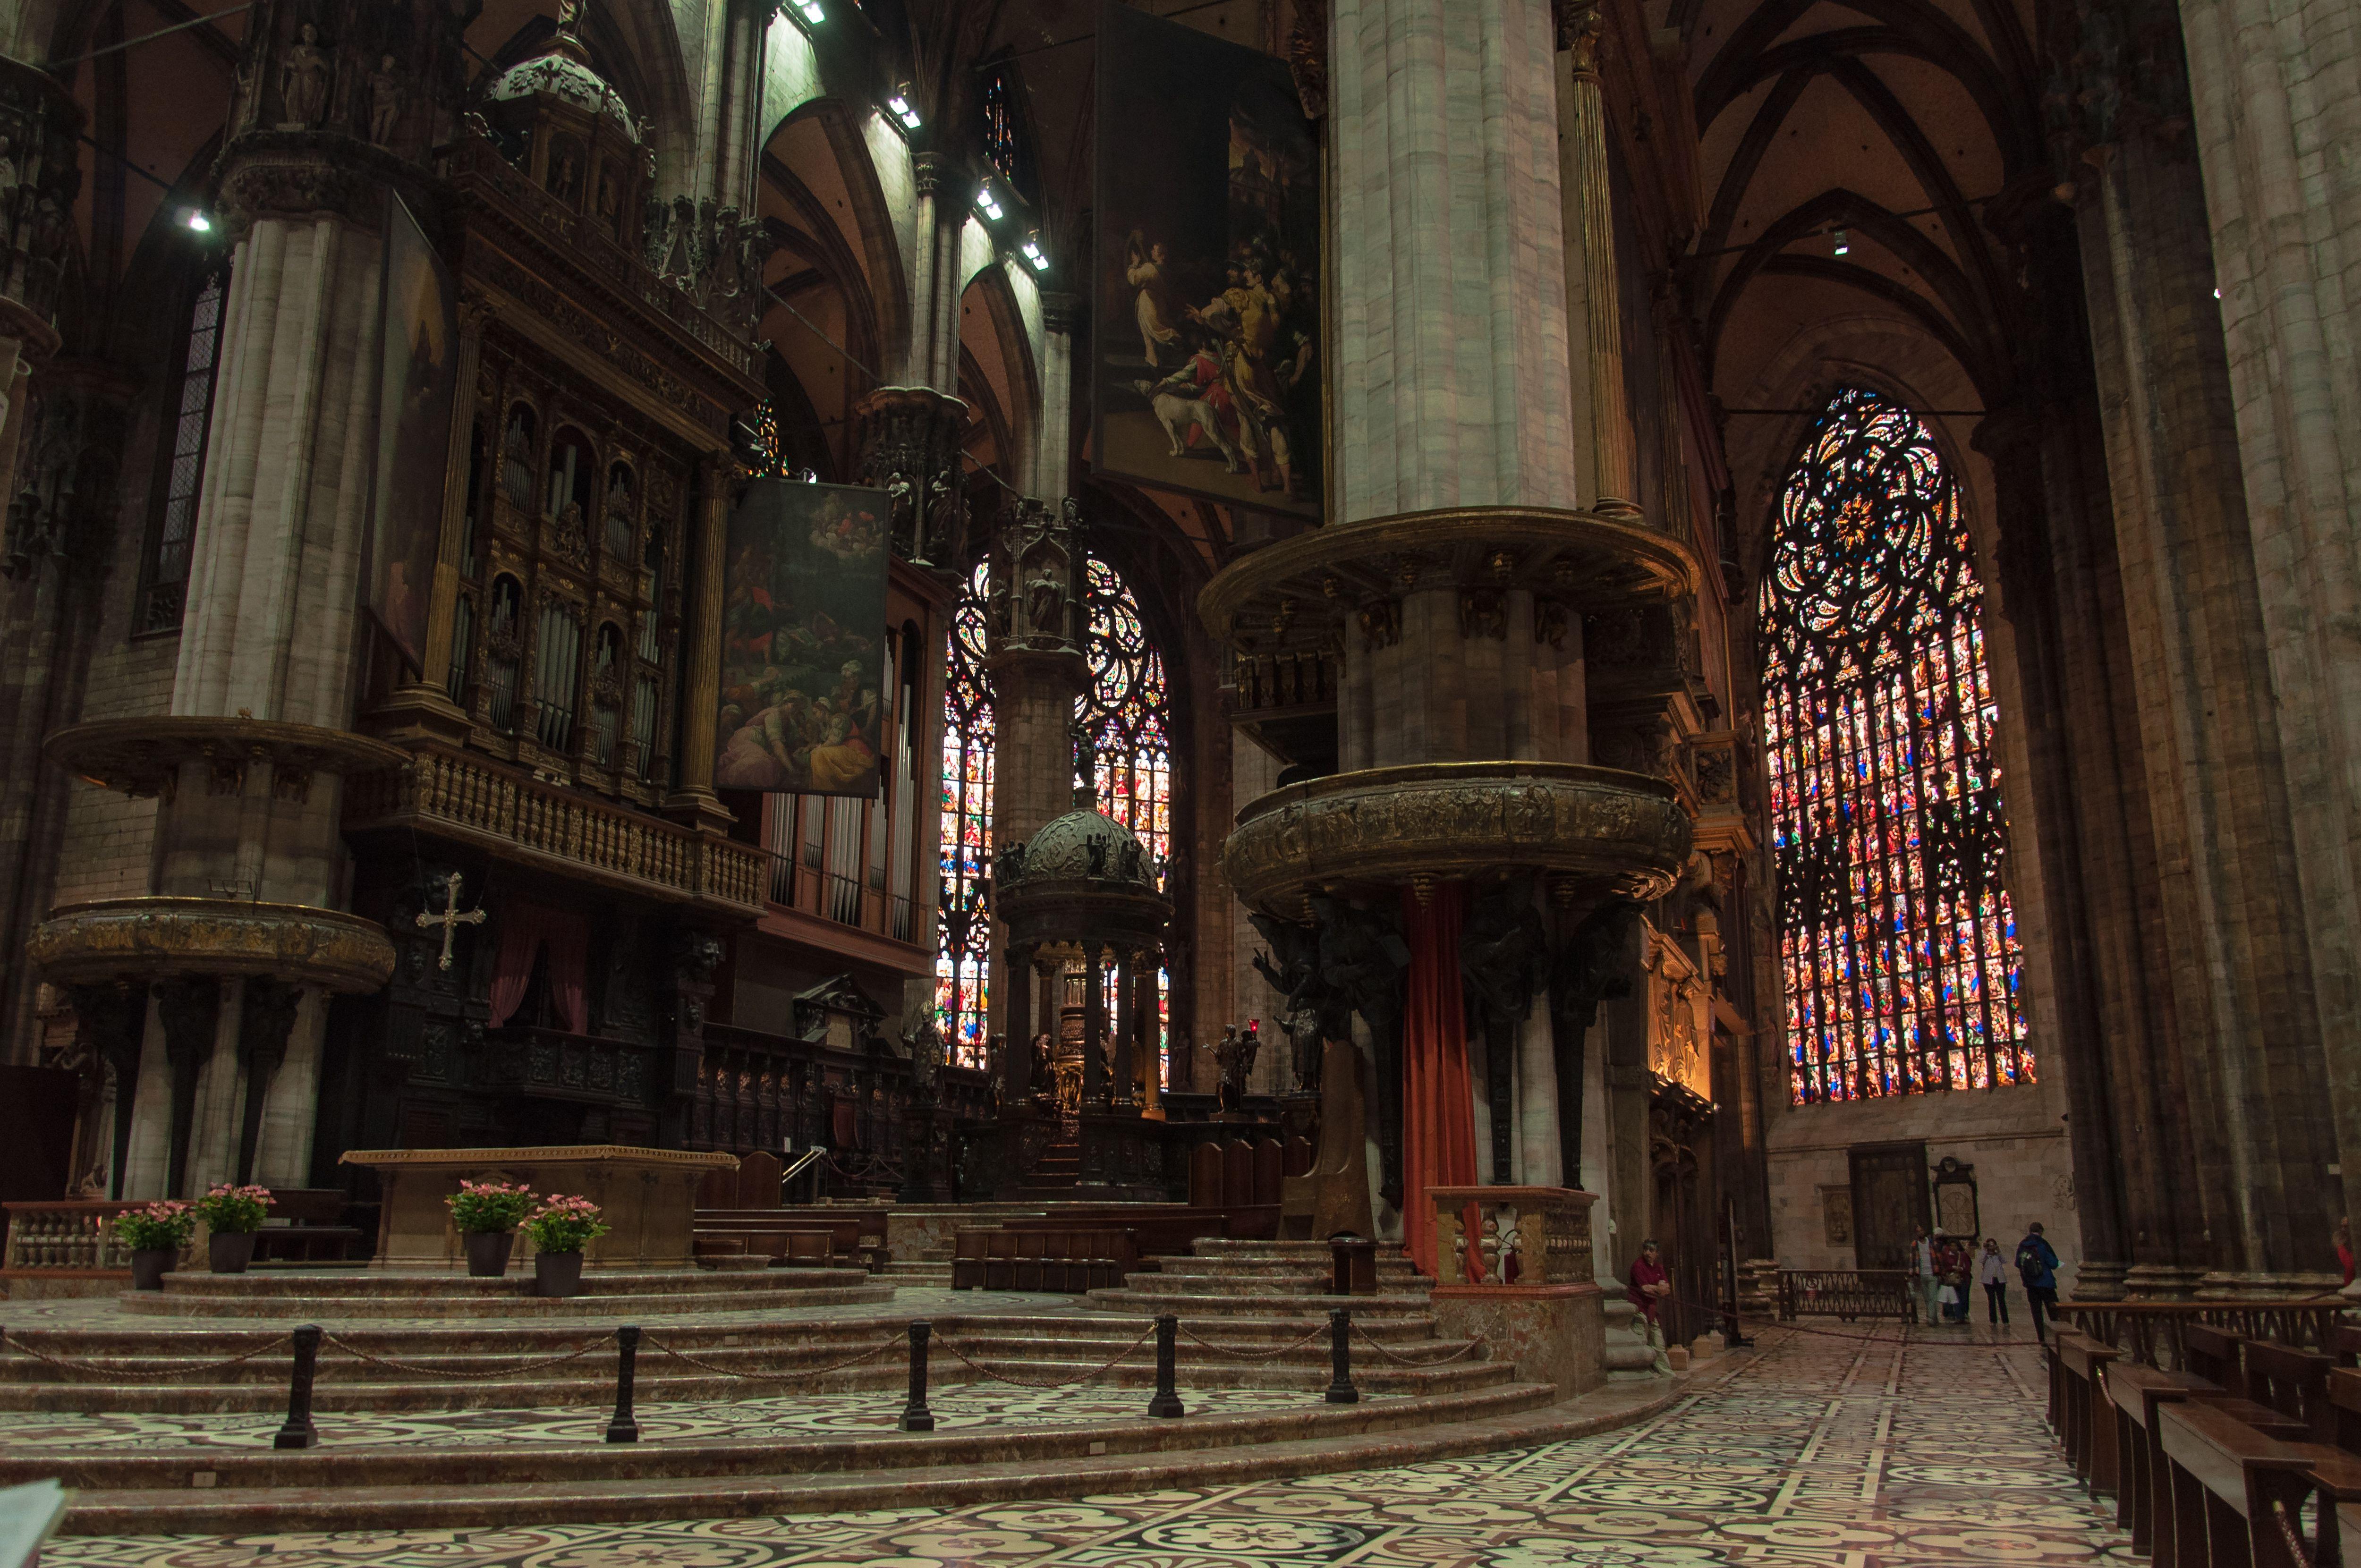 Inside of the Duomo di Milano, Milan Cathedral